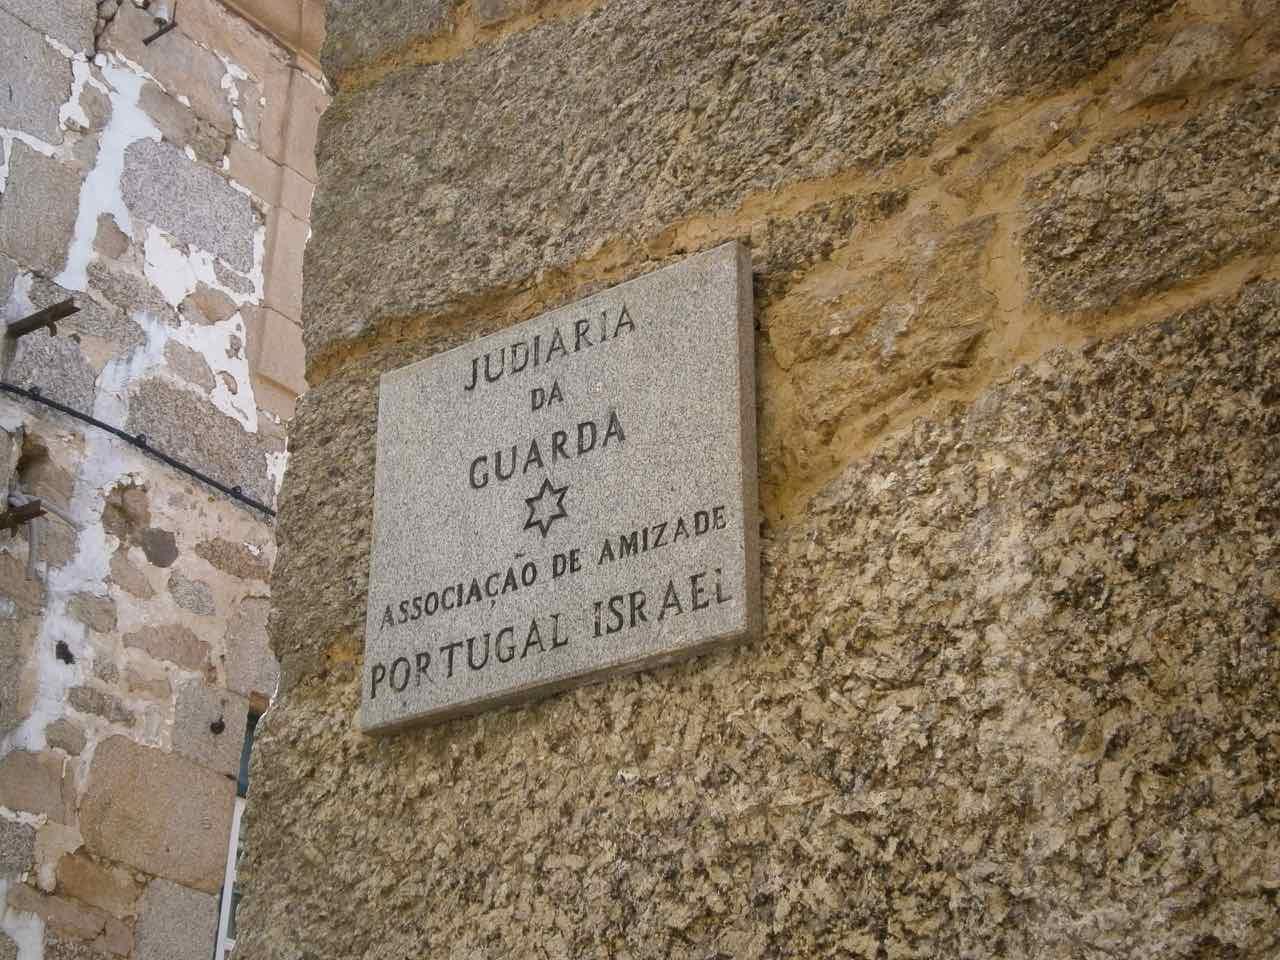 Jewish synagogue temple Portugal Judiaria